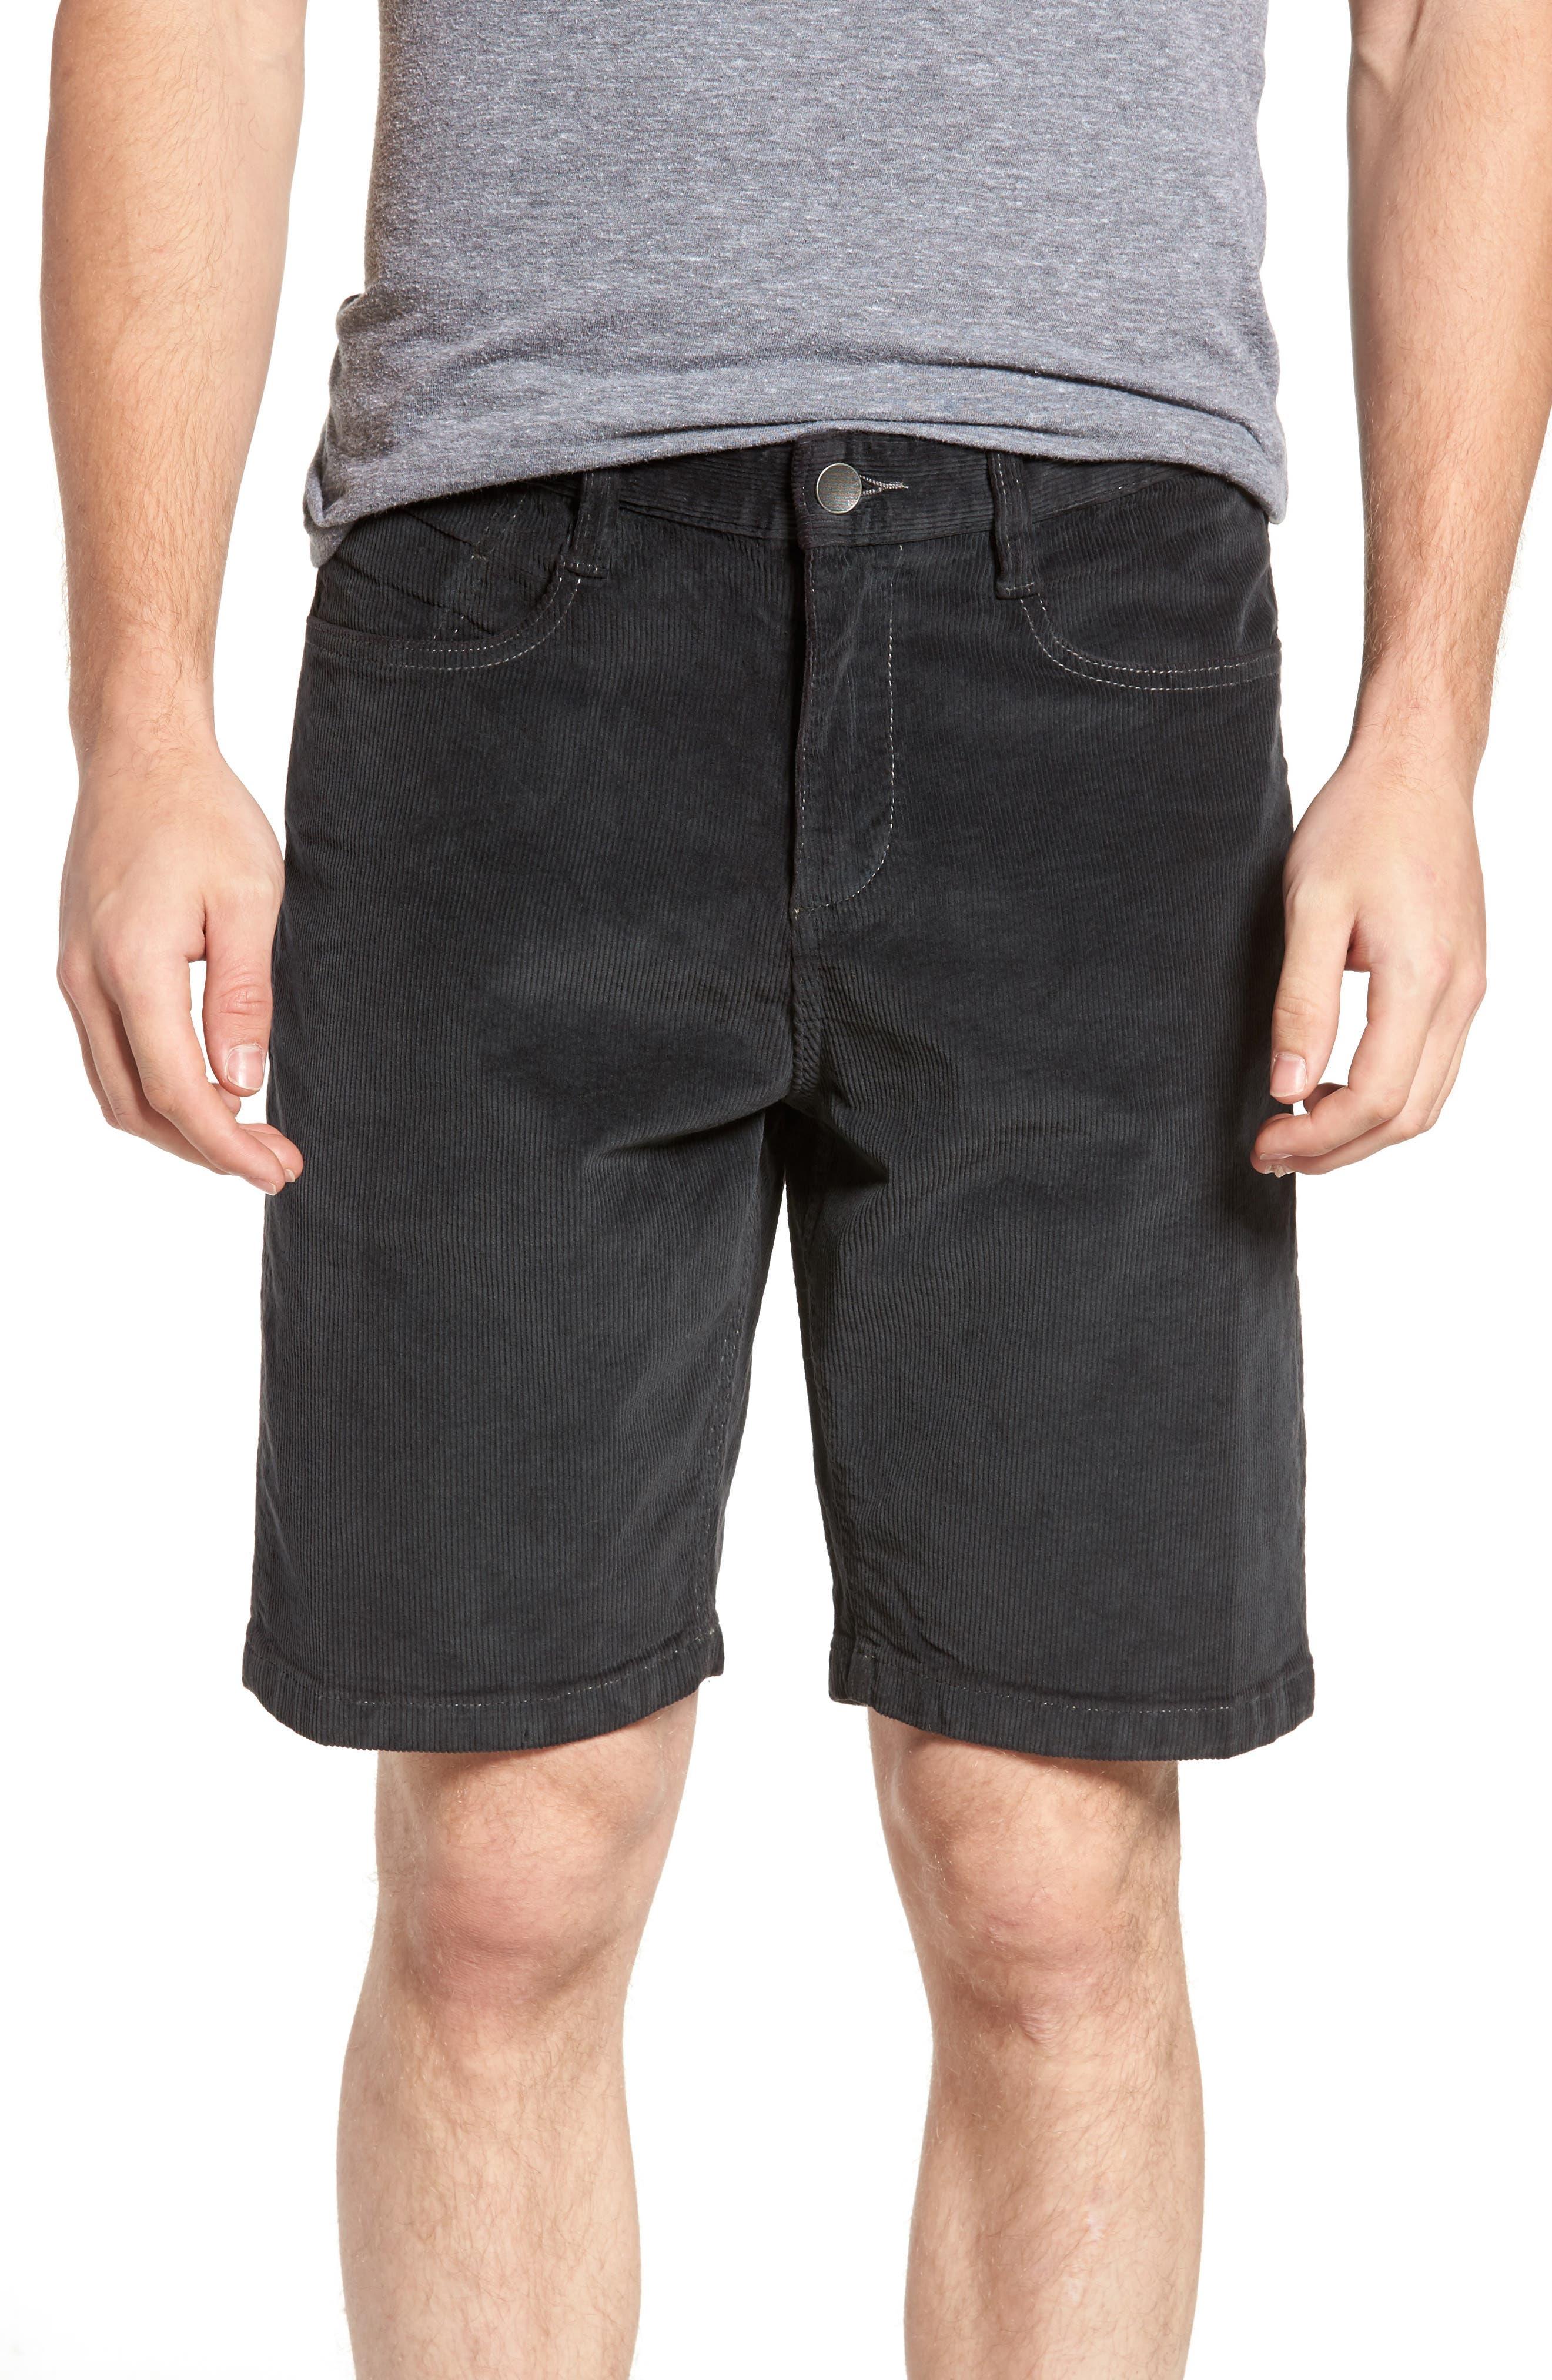 Outsider Corduroy Shorts,                             Main thumbnail 1, color,                             010